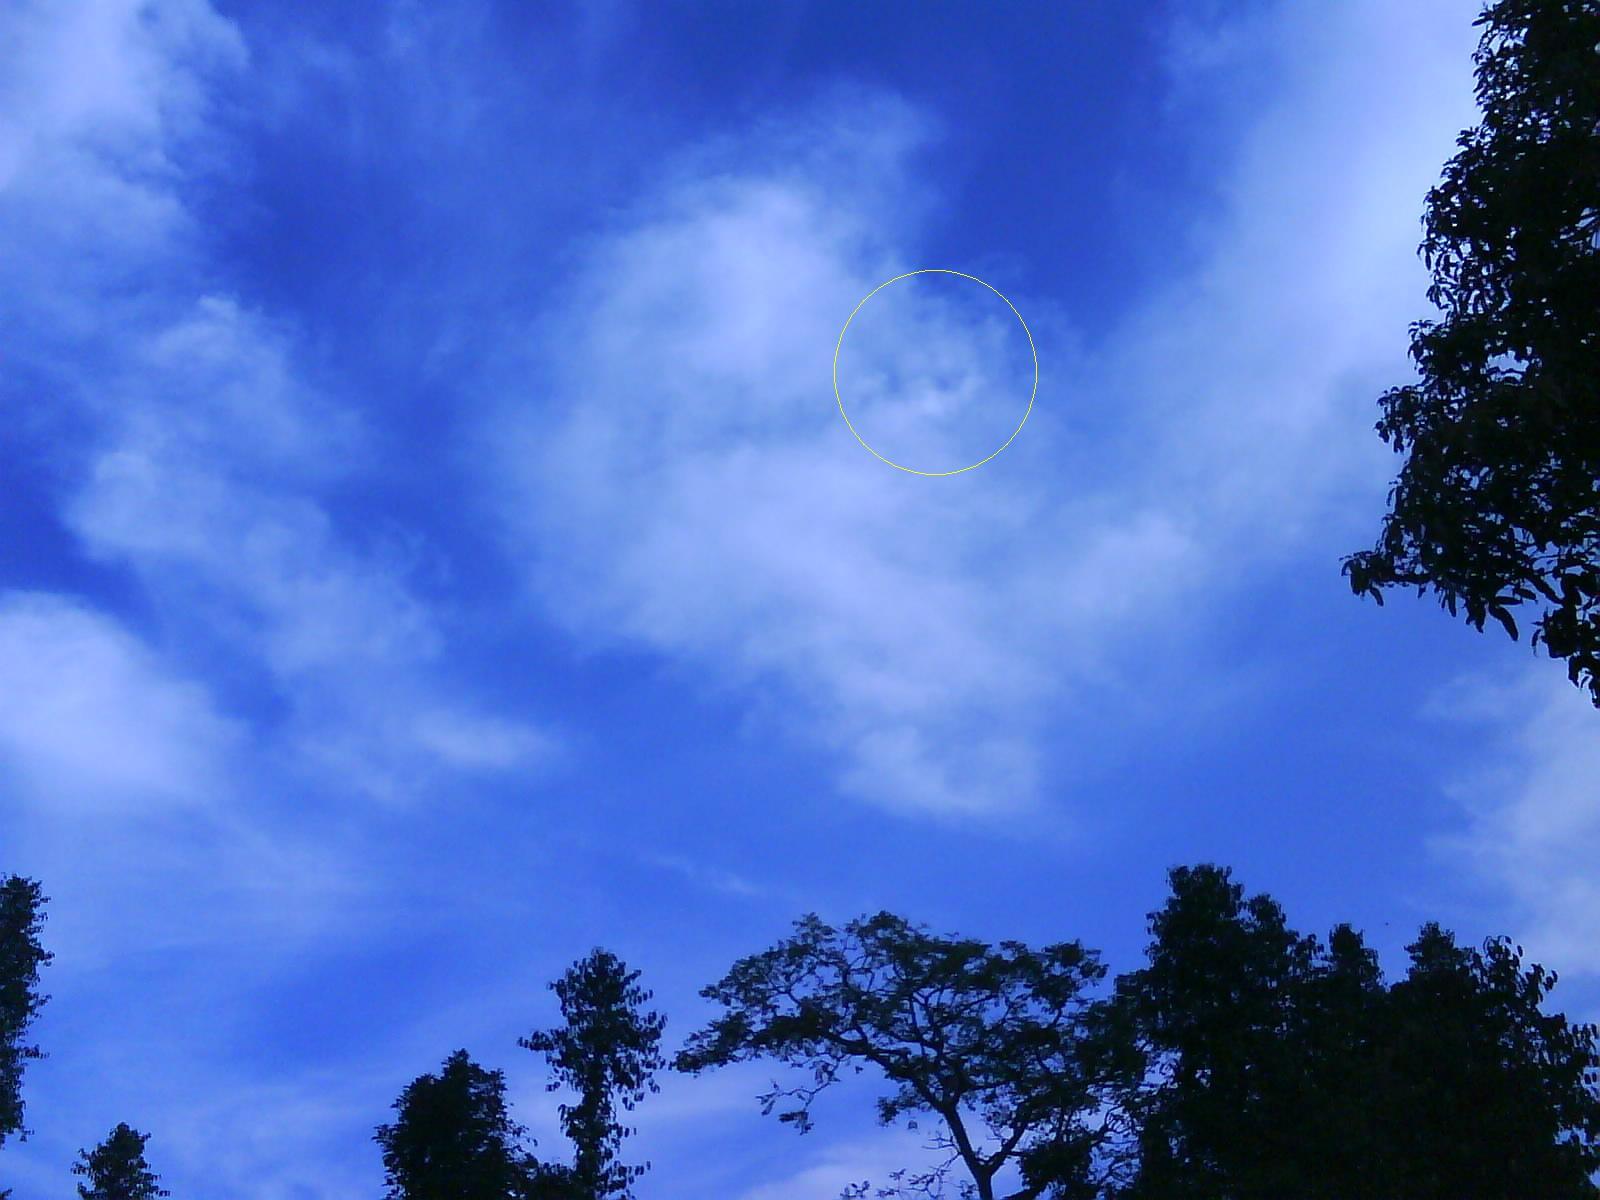 Allah SWT awan kalimat Allah langit tanda-tanda kebesaran Allah